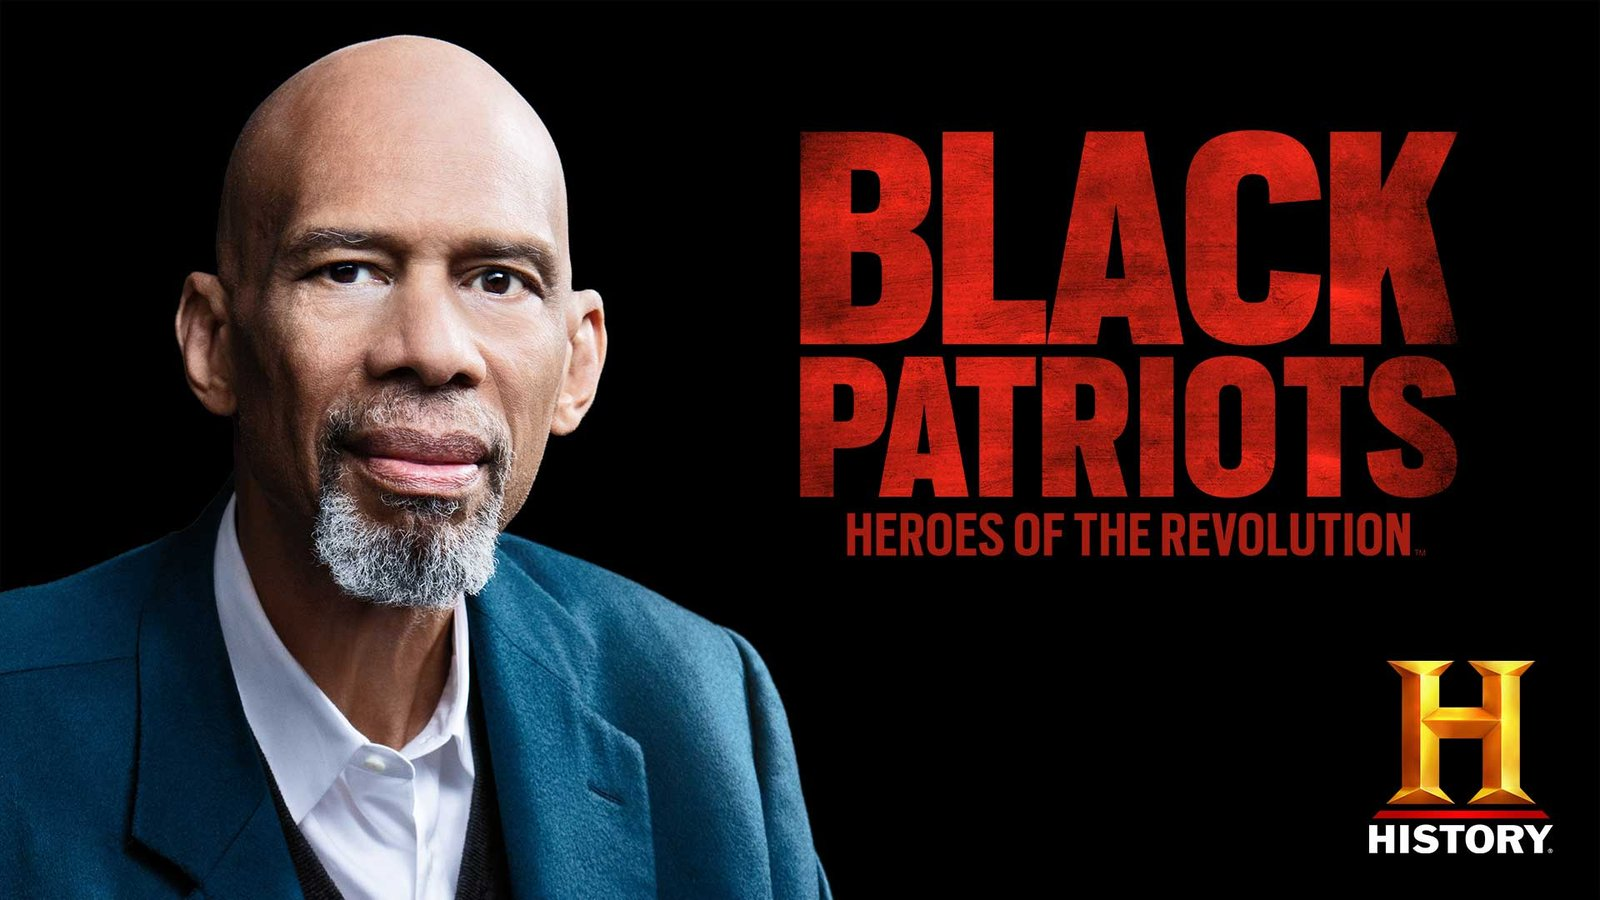 Black Patriots: Heroes of the Revolution